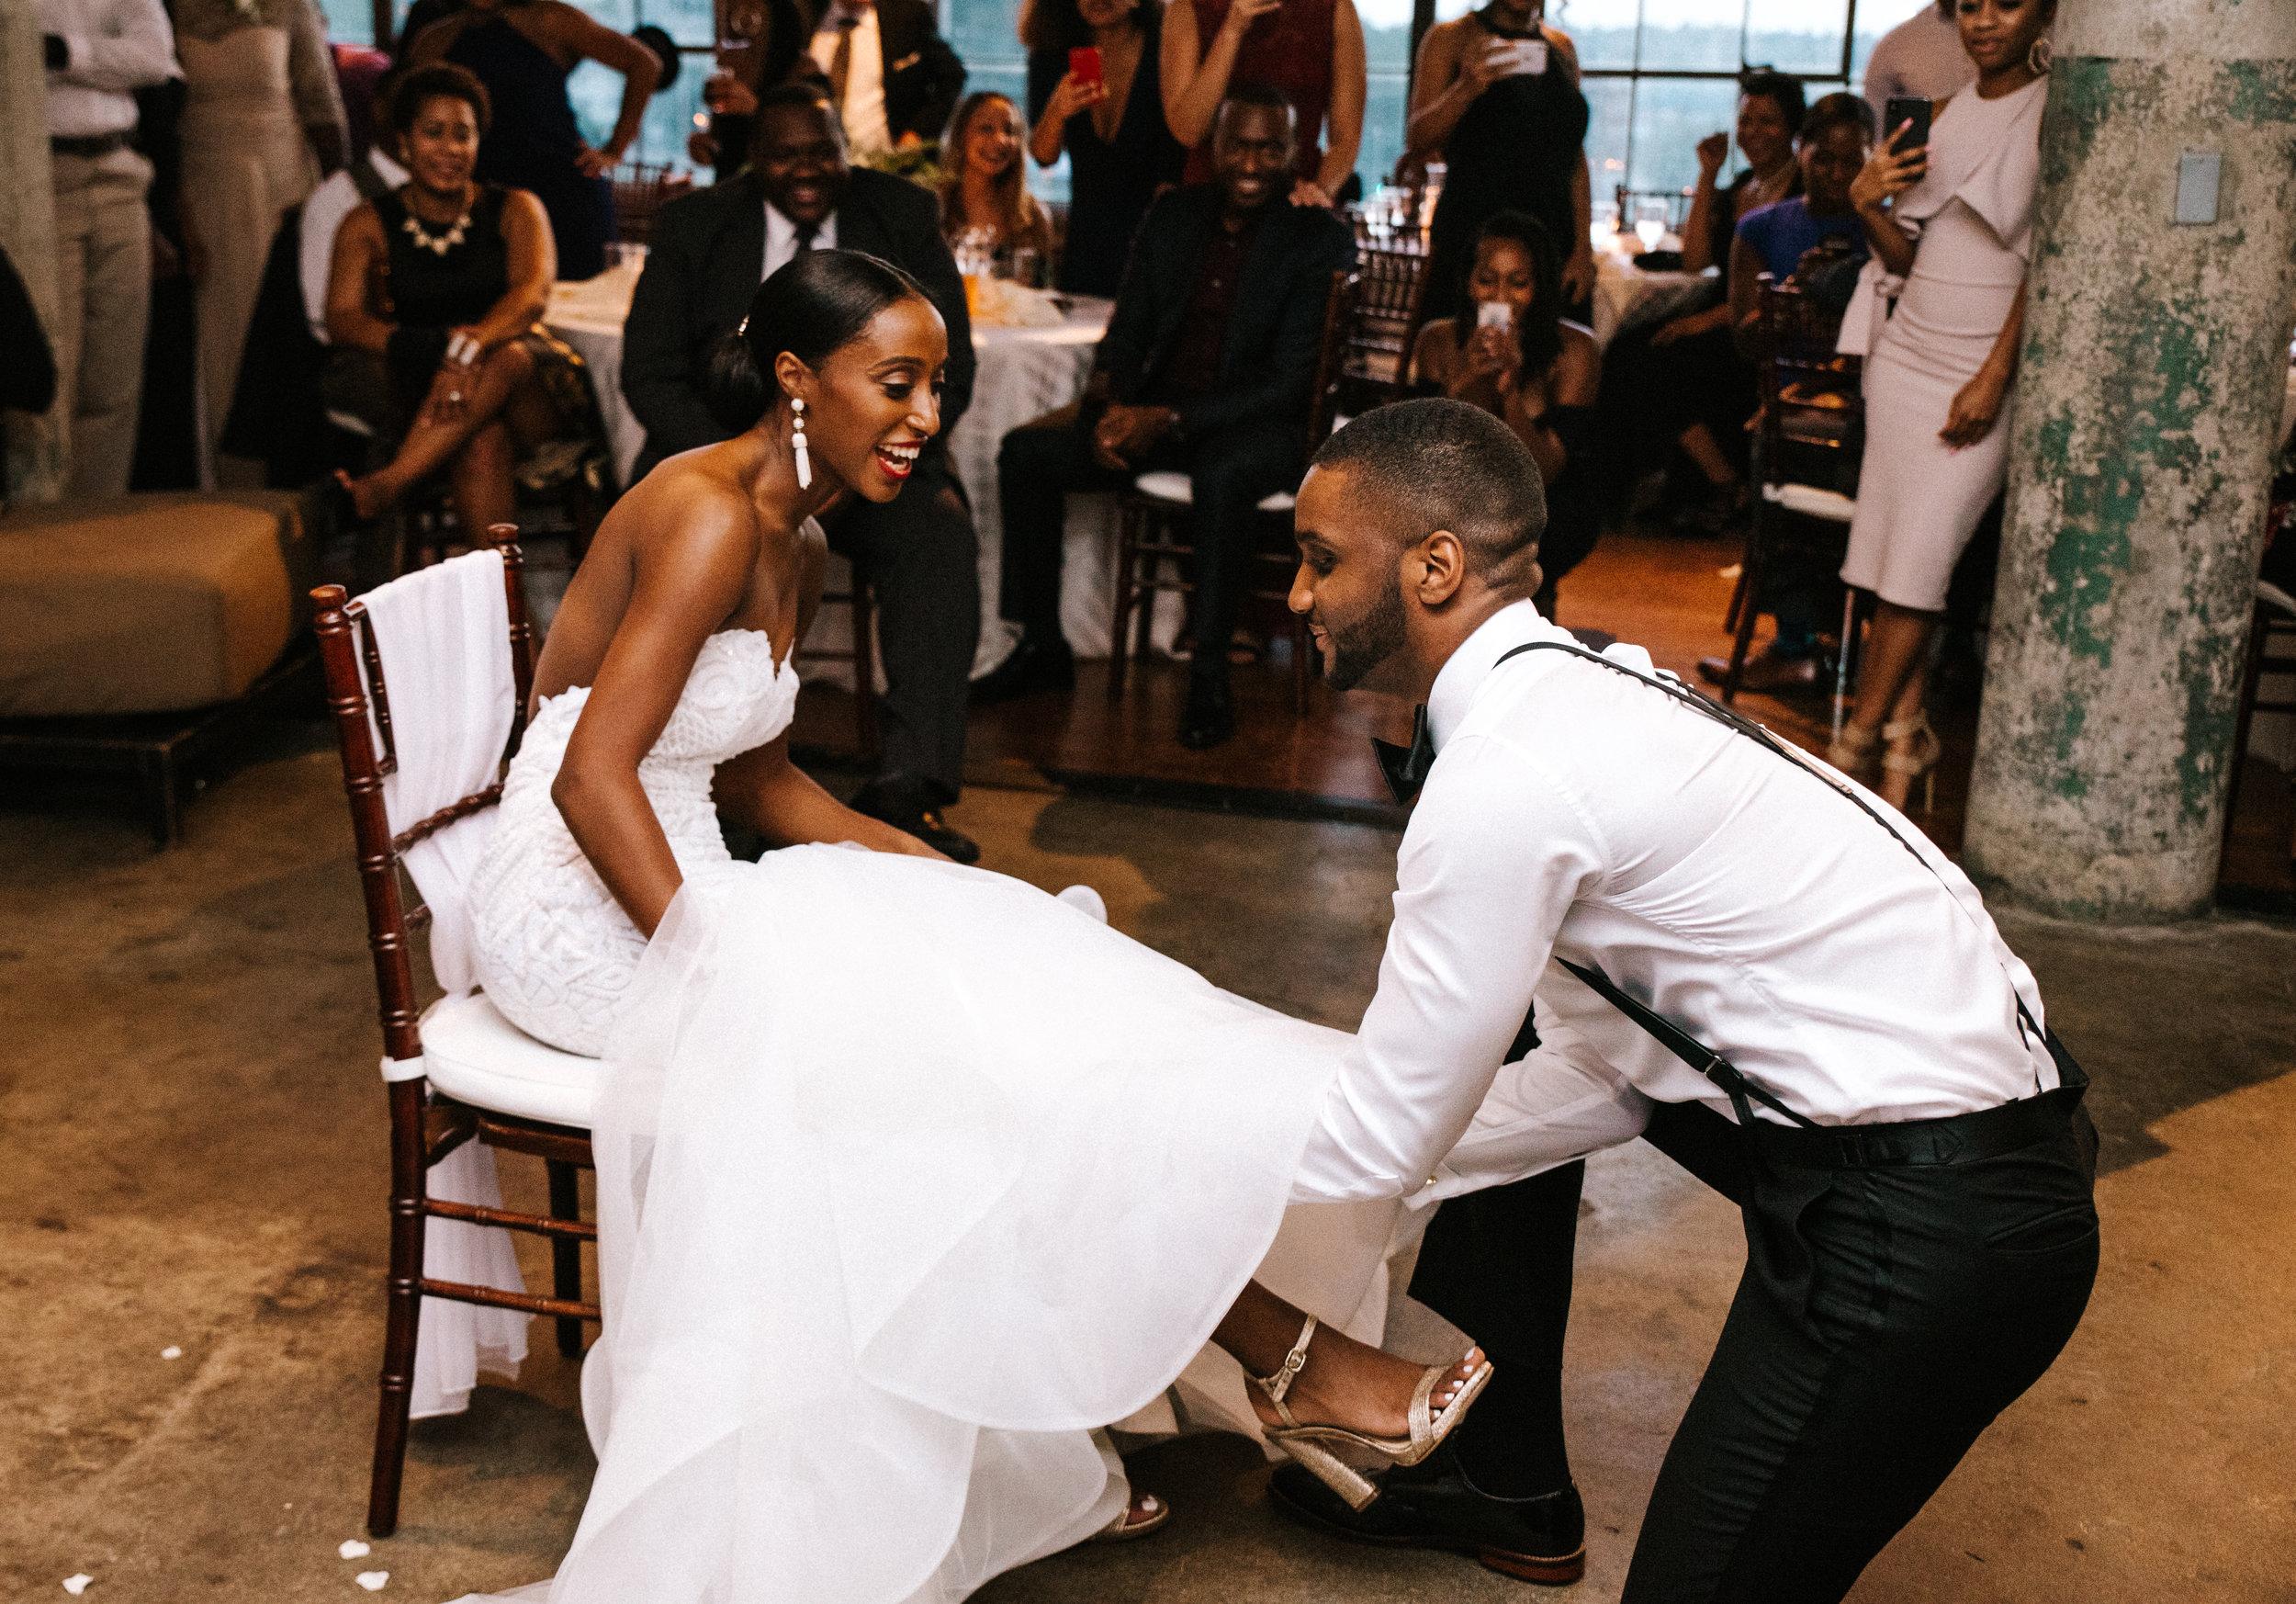 The Lofts at Union Square, High Point, NC. Wedding Reception Photos, Garter Toss Photos. North Carolina Wedding Photographer, Marina Rey Photography.